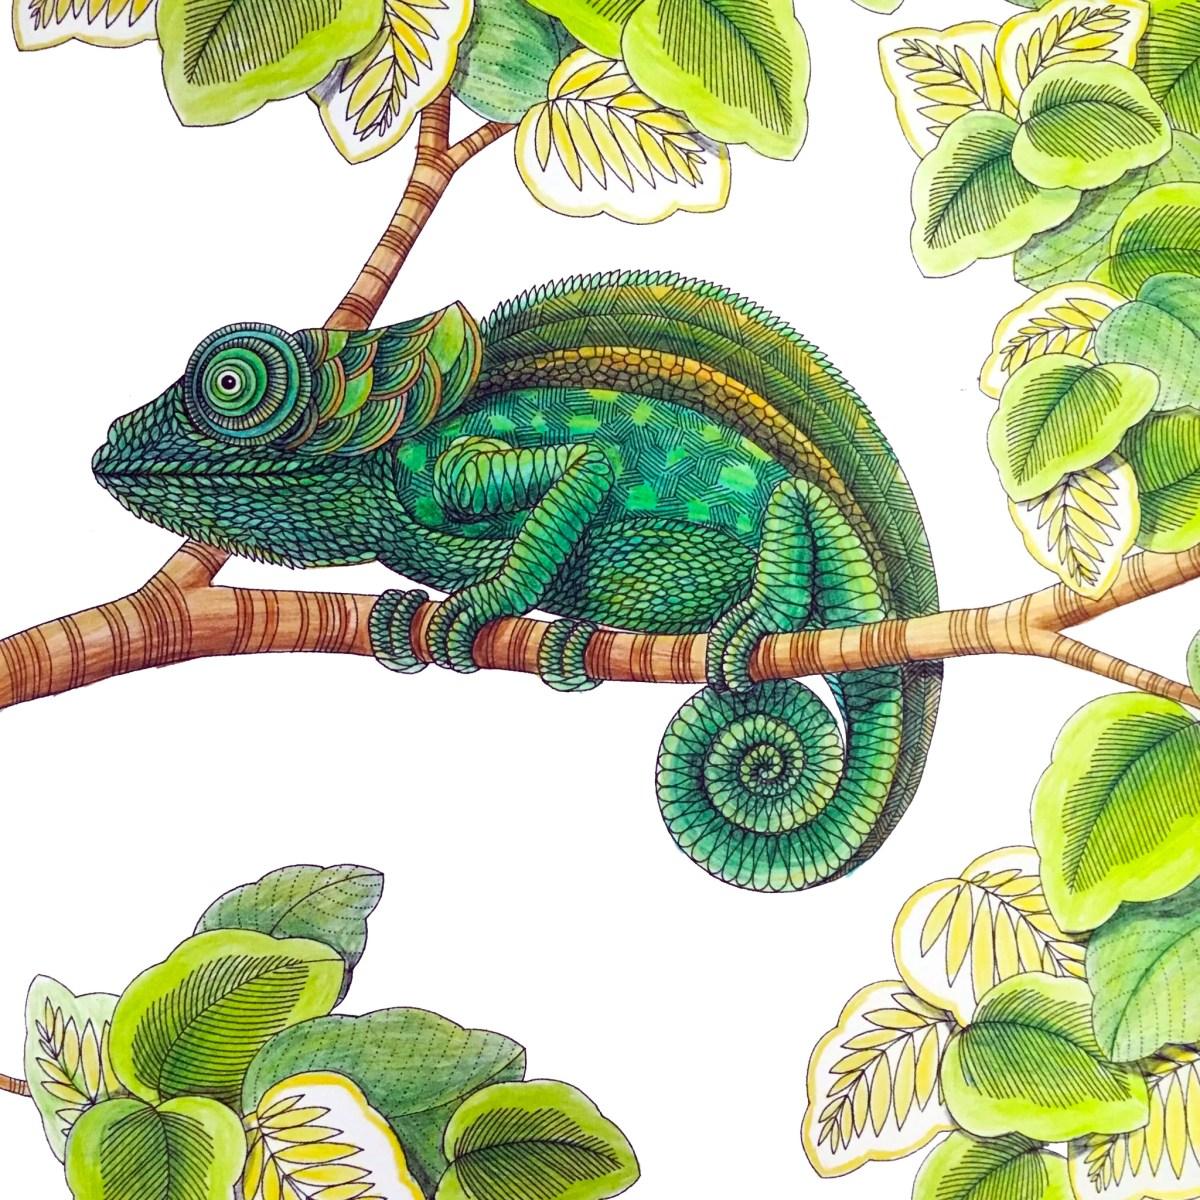 Chameleon, Animal Kingdom by Millie Marotta